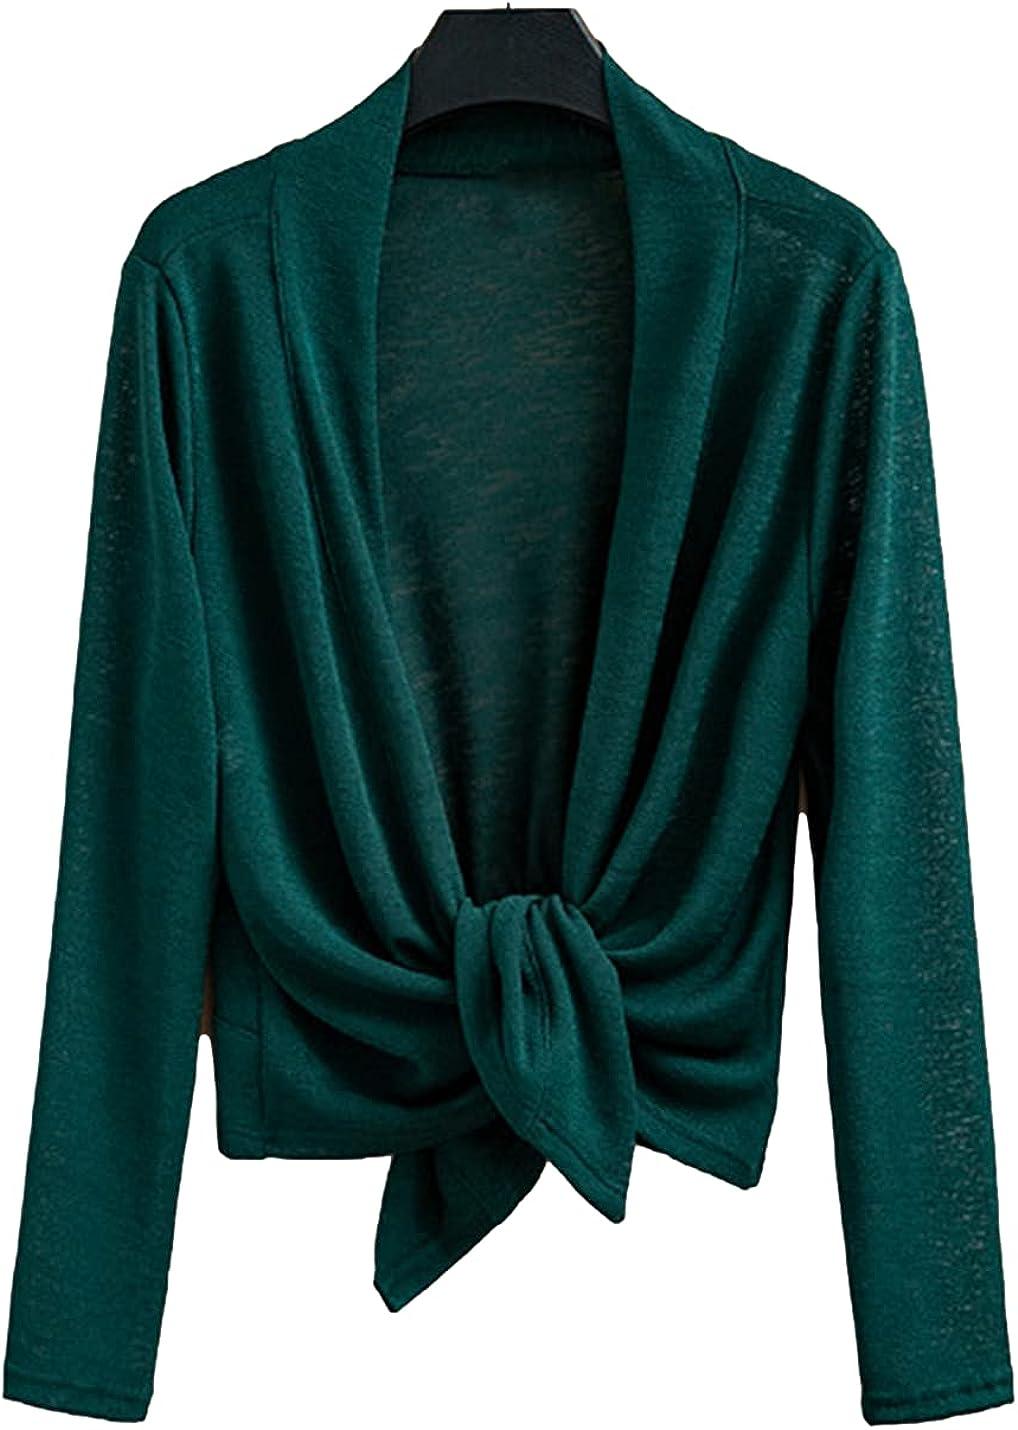 FindThy Women's Lace Knit Tiefront Cardigan Long Sleeve Sheer Cropped Bolero Jacket Shrug